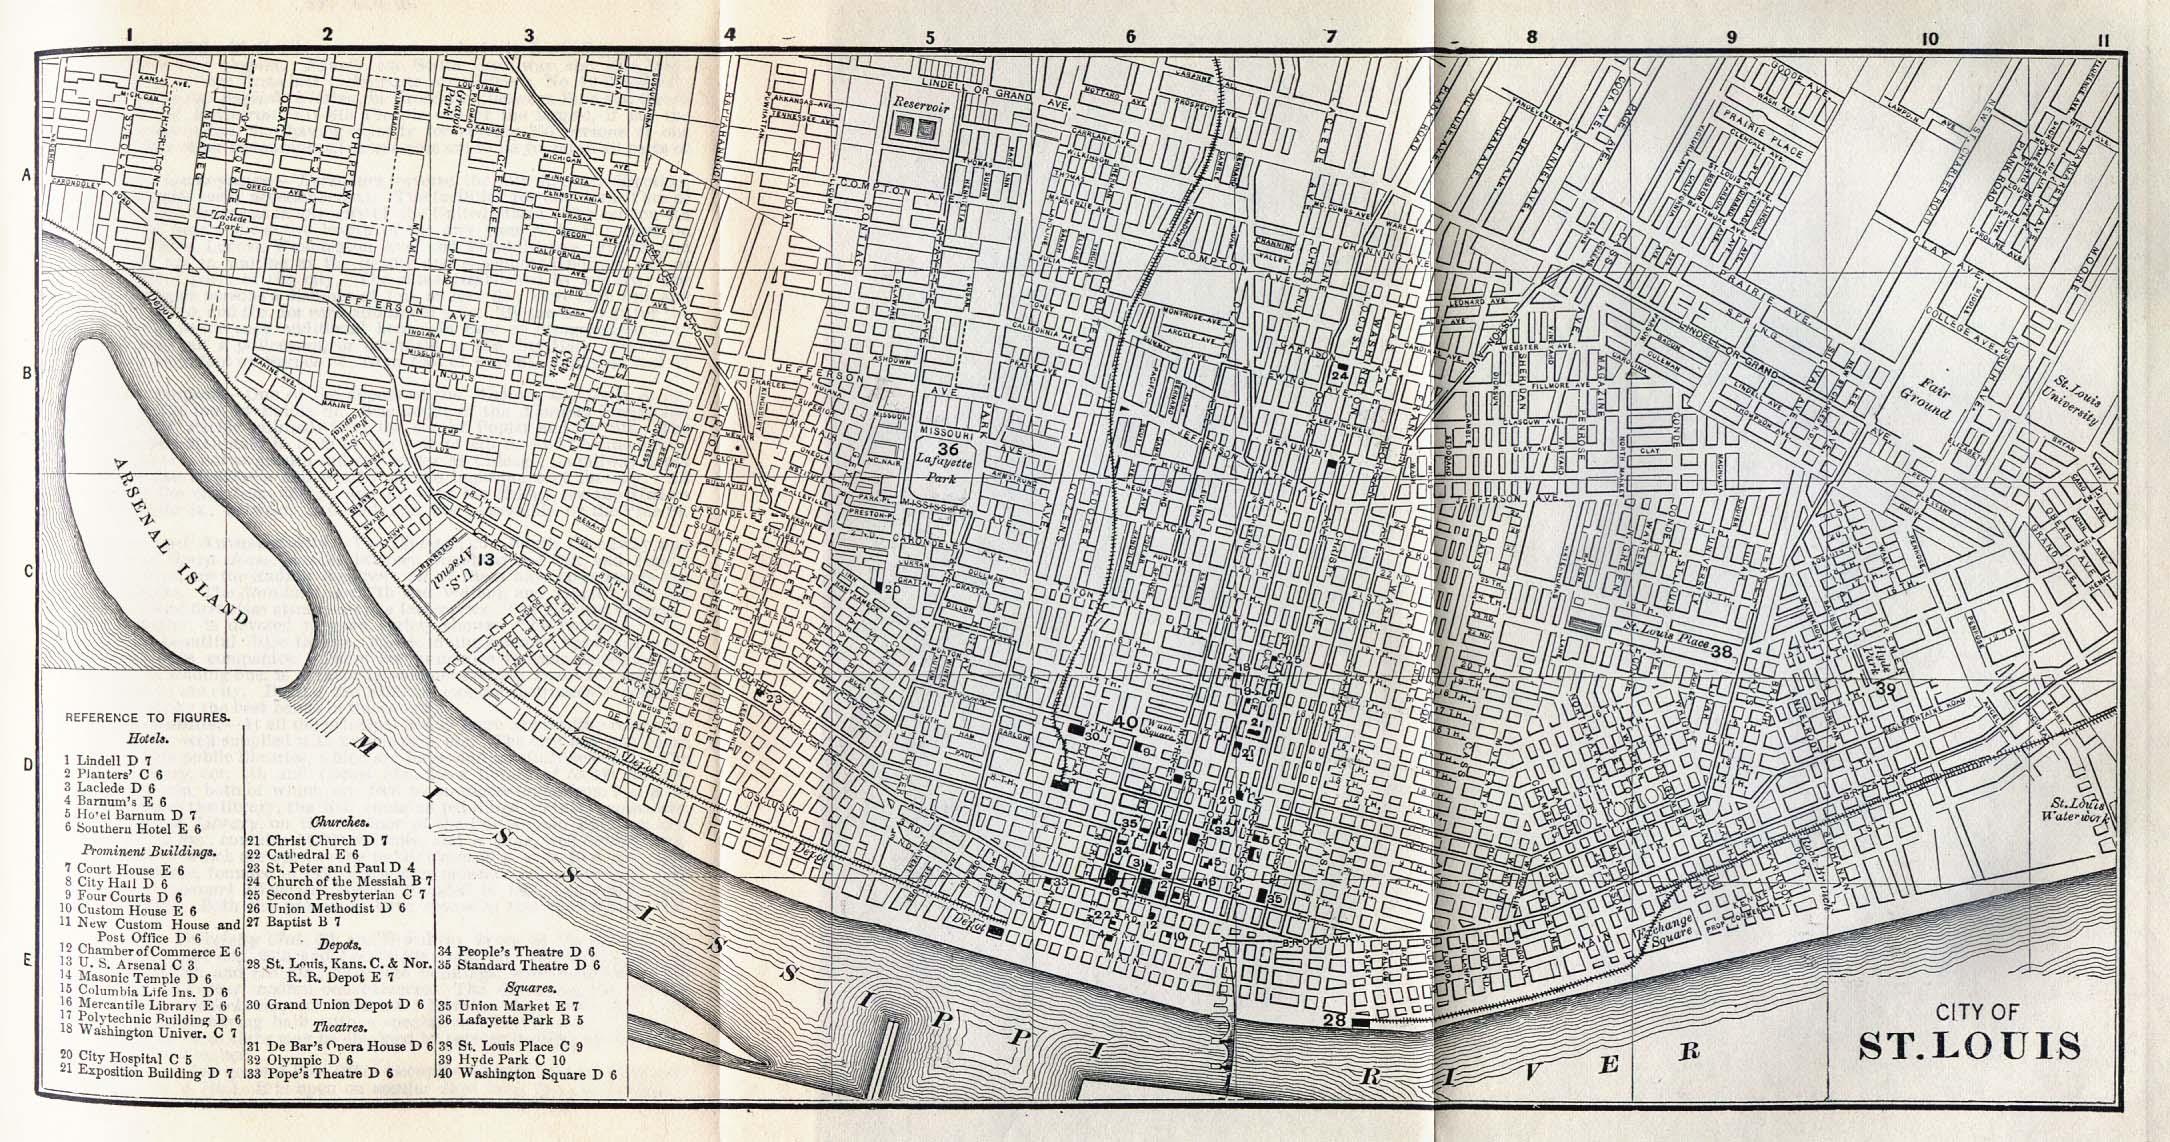 Saint Louis City Map, Missouri, United States 1885